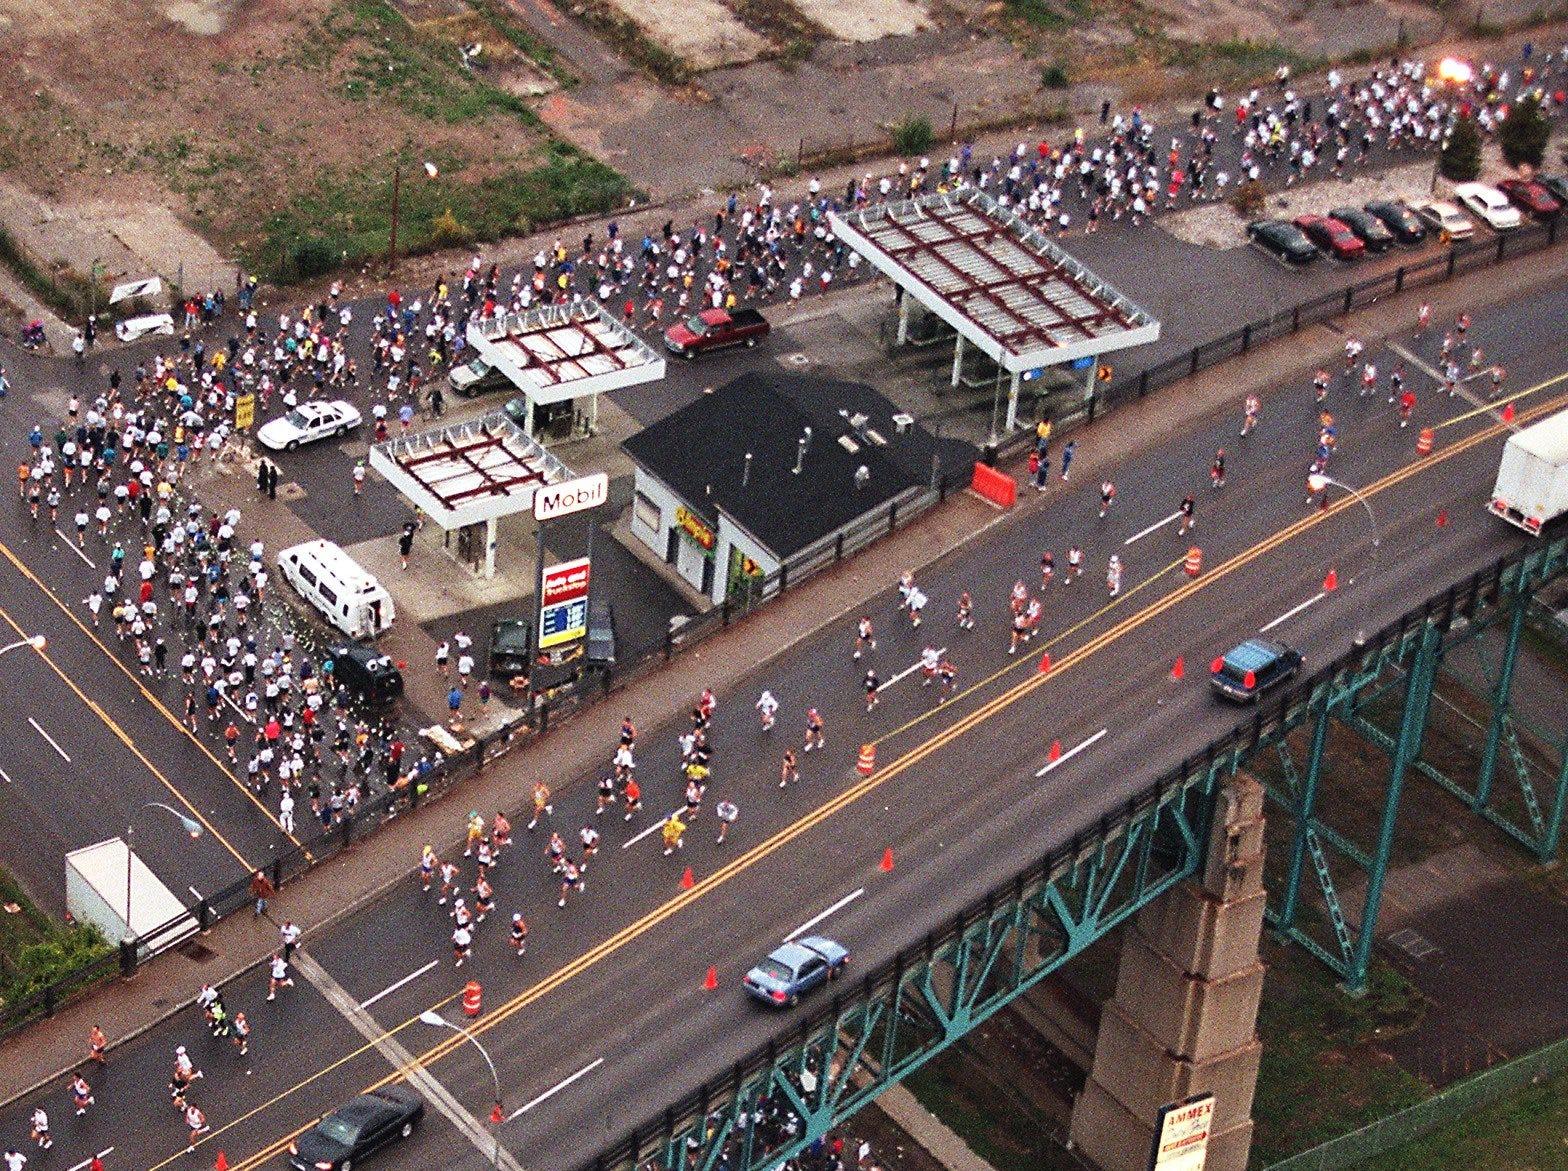 Runners make their way under and then across the Ambassador Bridge during The Detroit Free Press/Flagstar Bank International Marathon Sunday, Oct. 17, 1999, in Detroit.